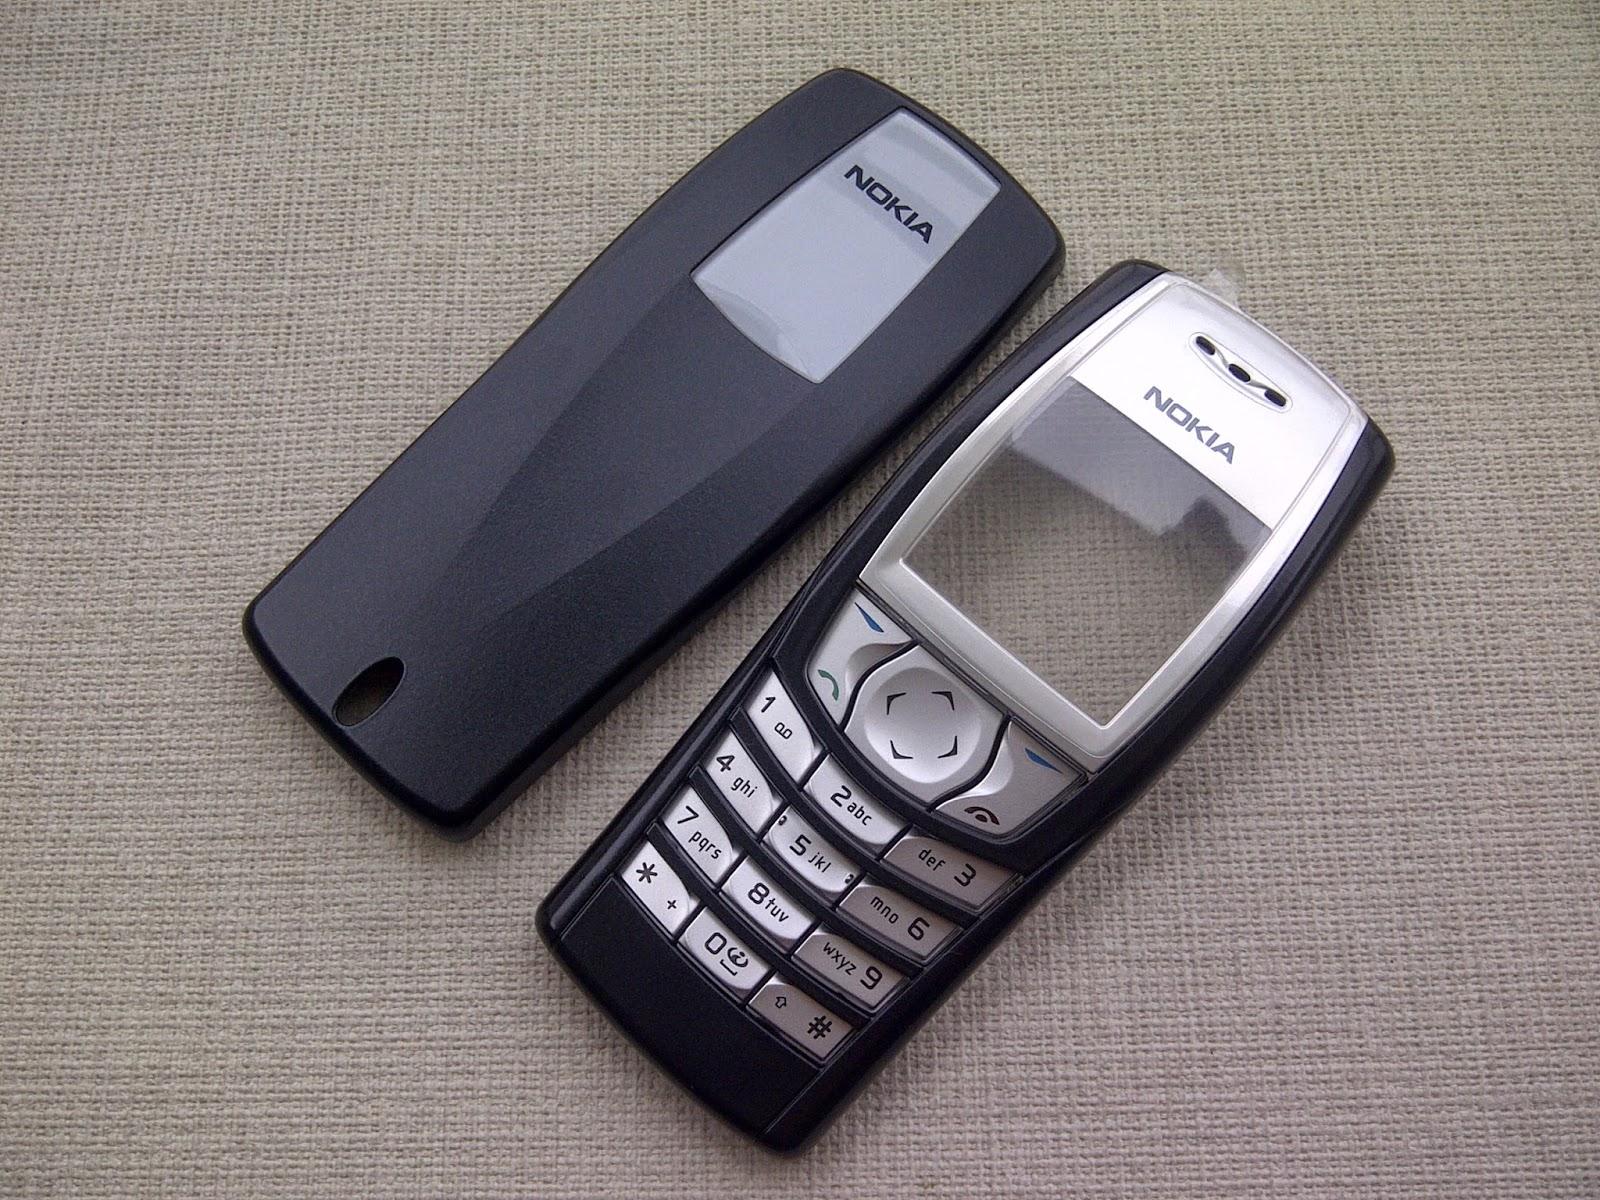 menjual casing handphone tipe lama rare item: nokia 6610